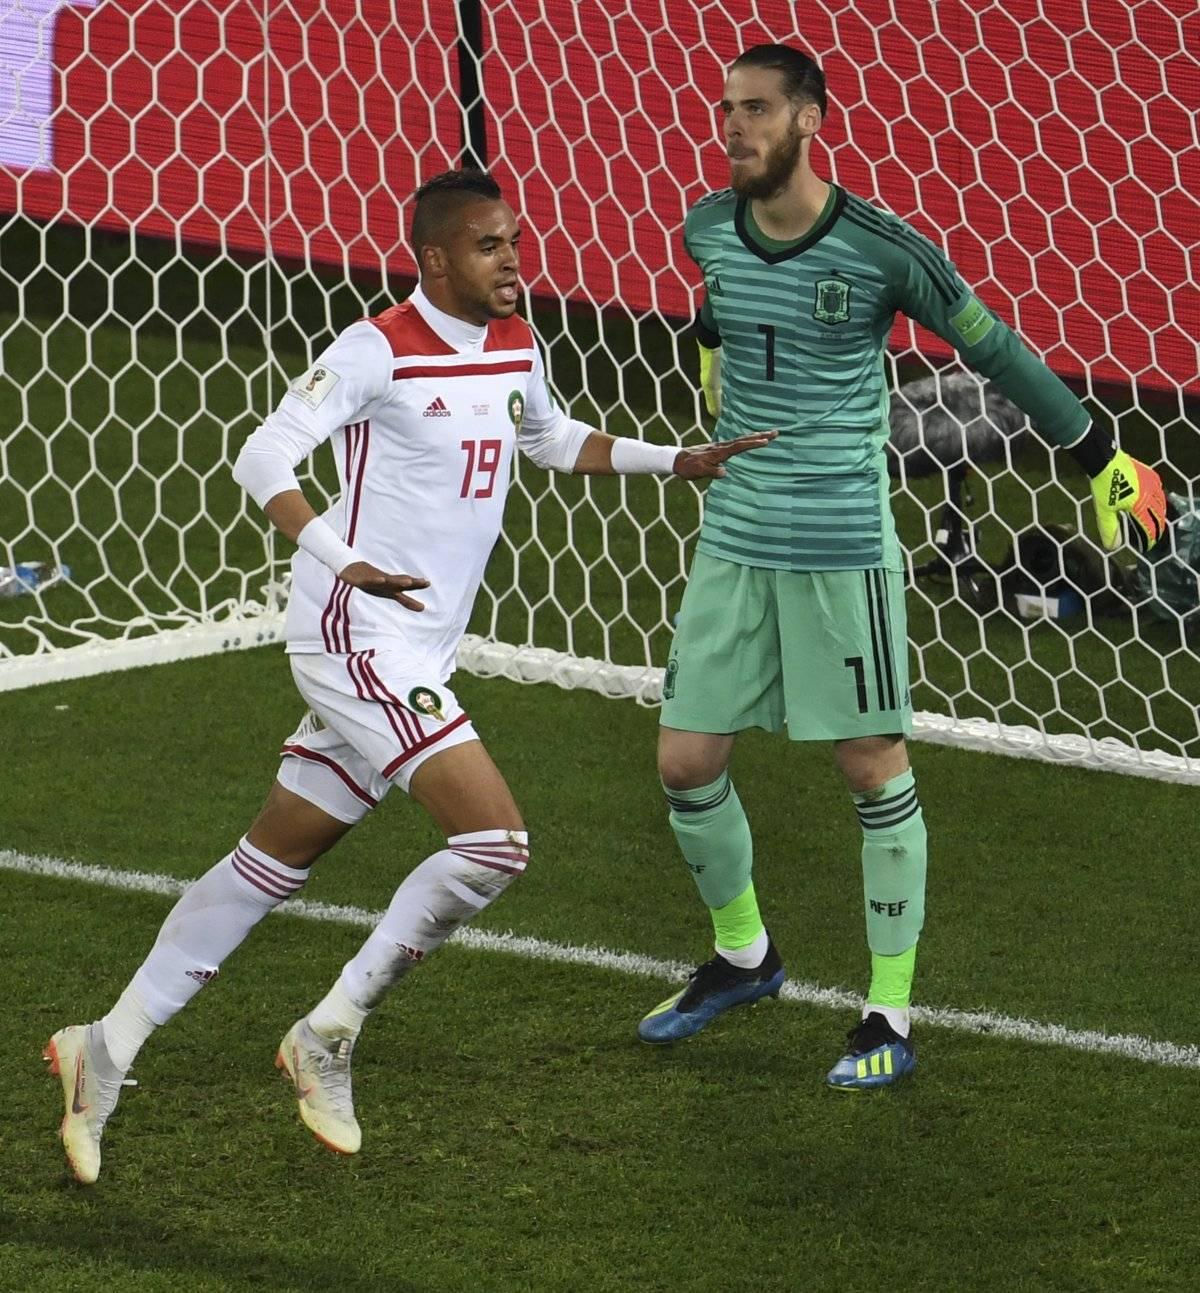 El empate de Marruecos